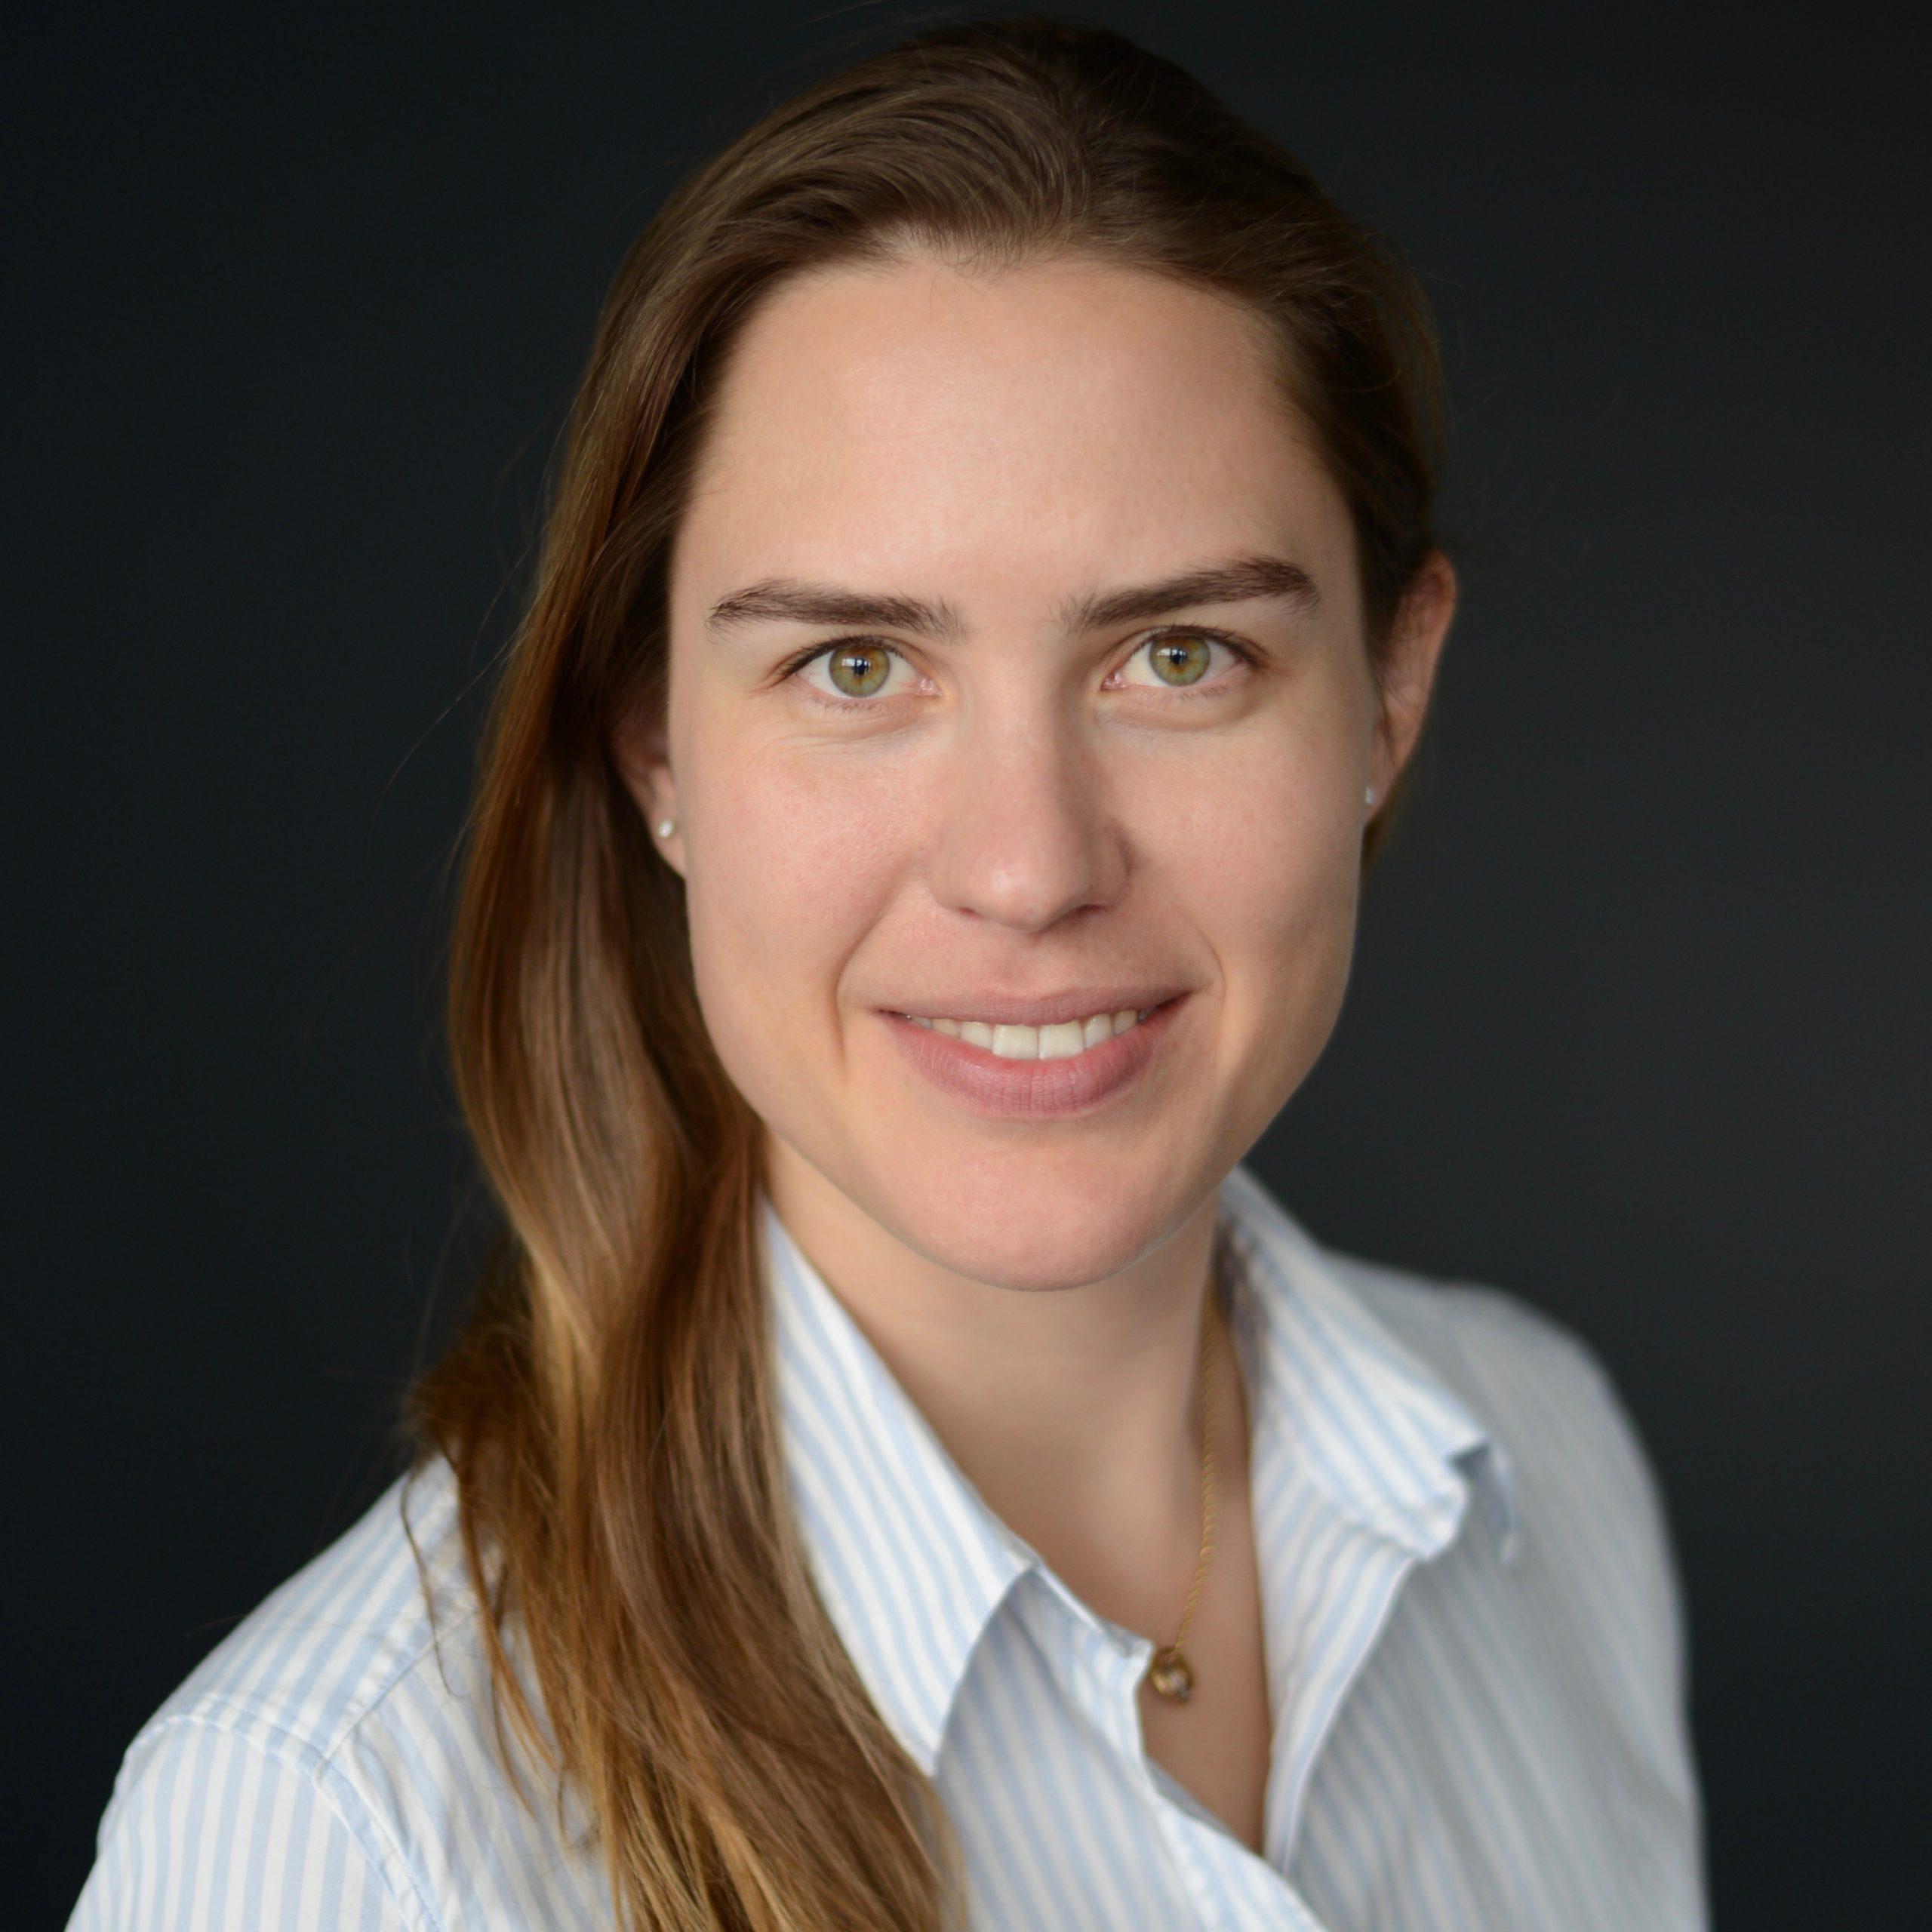 Josefine Tratwal